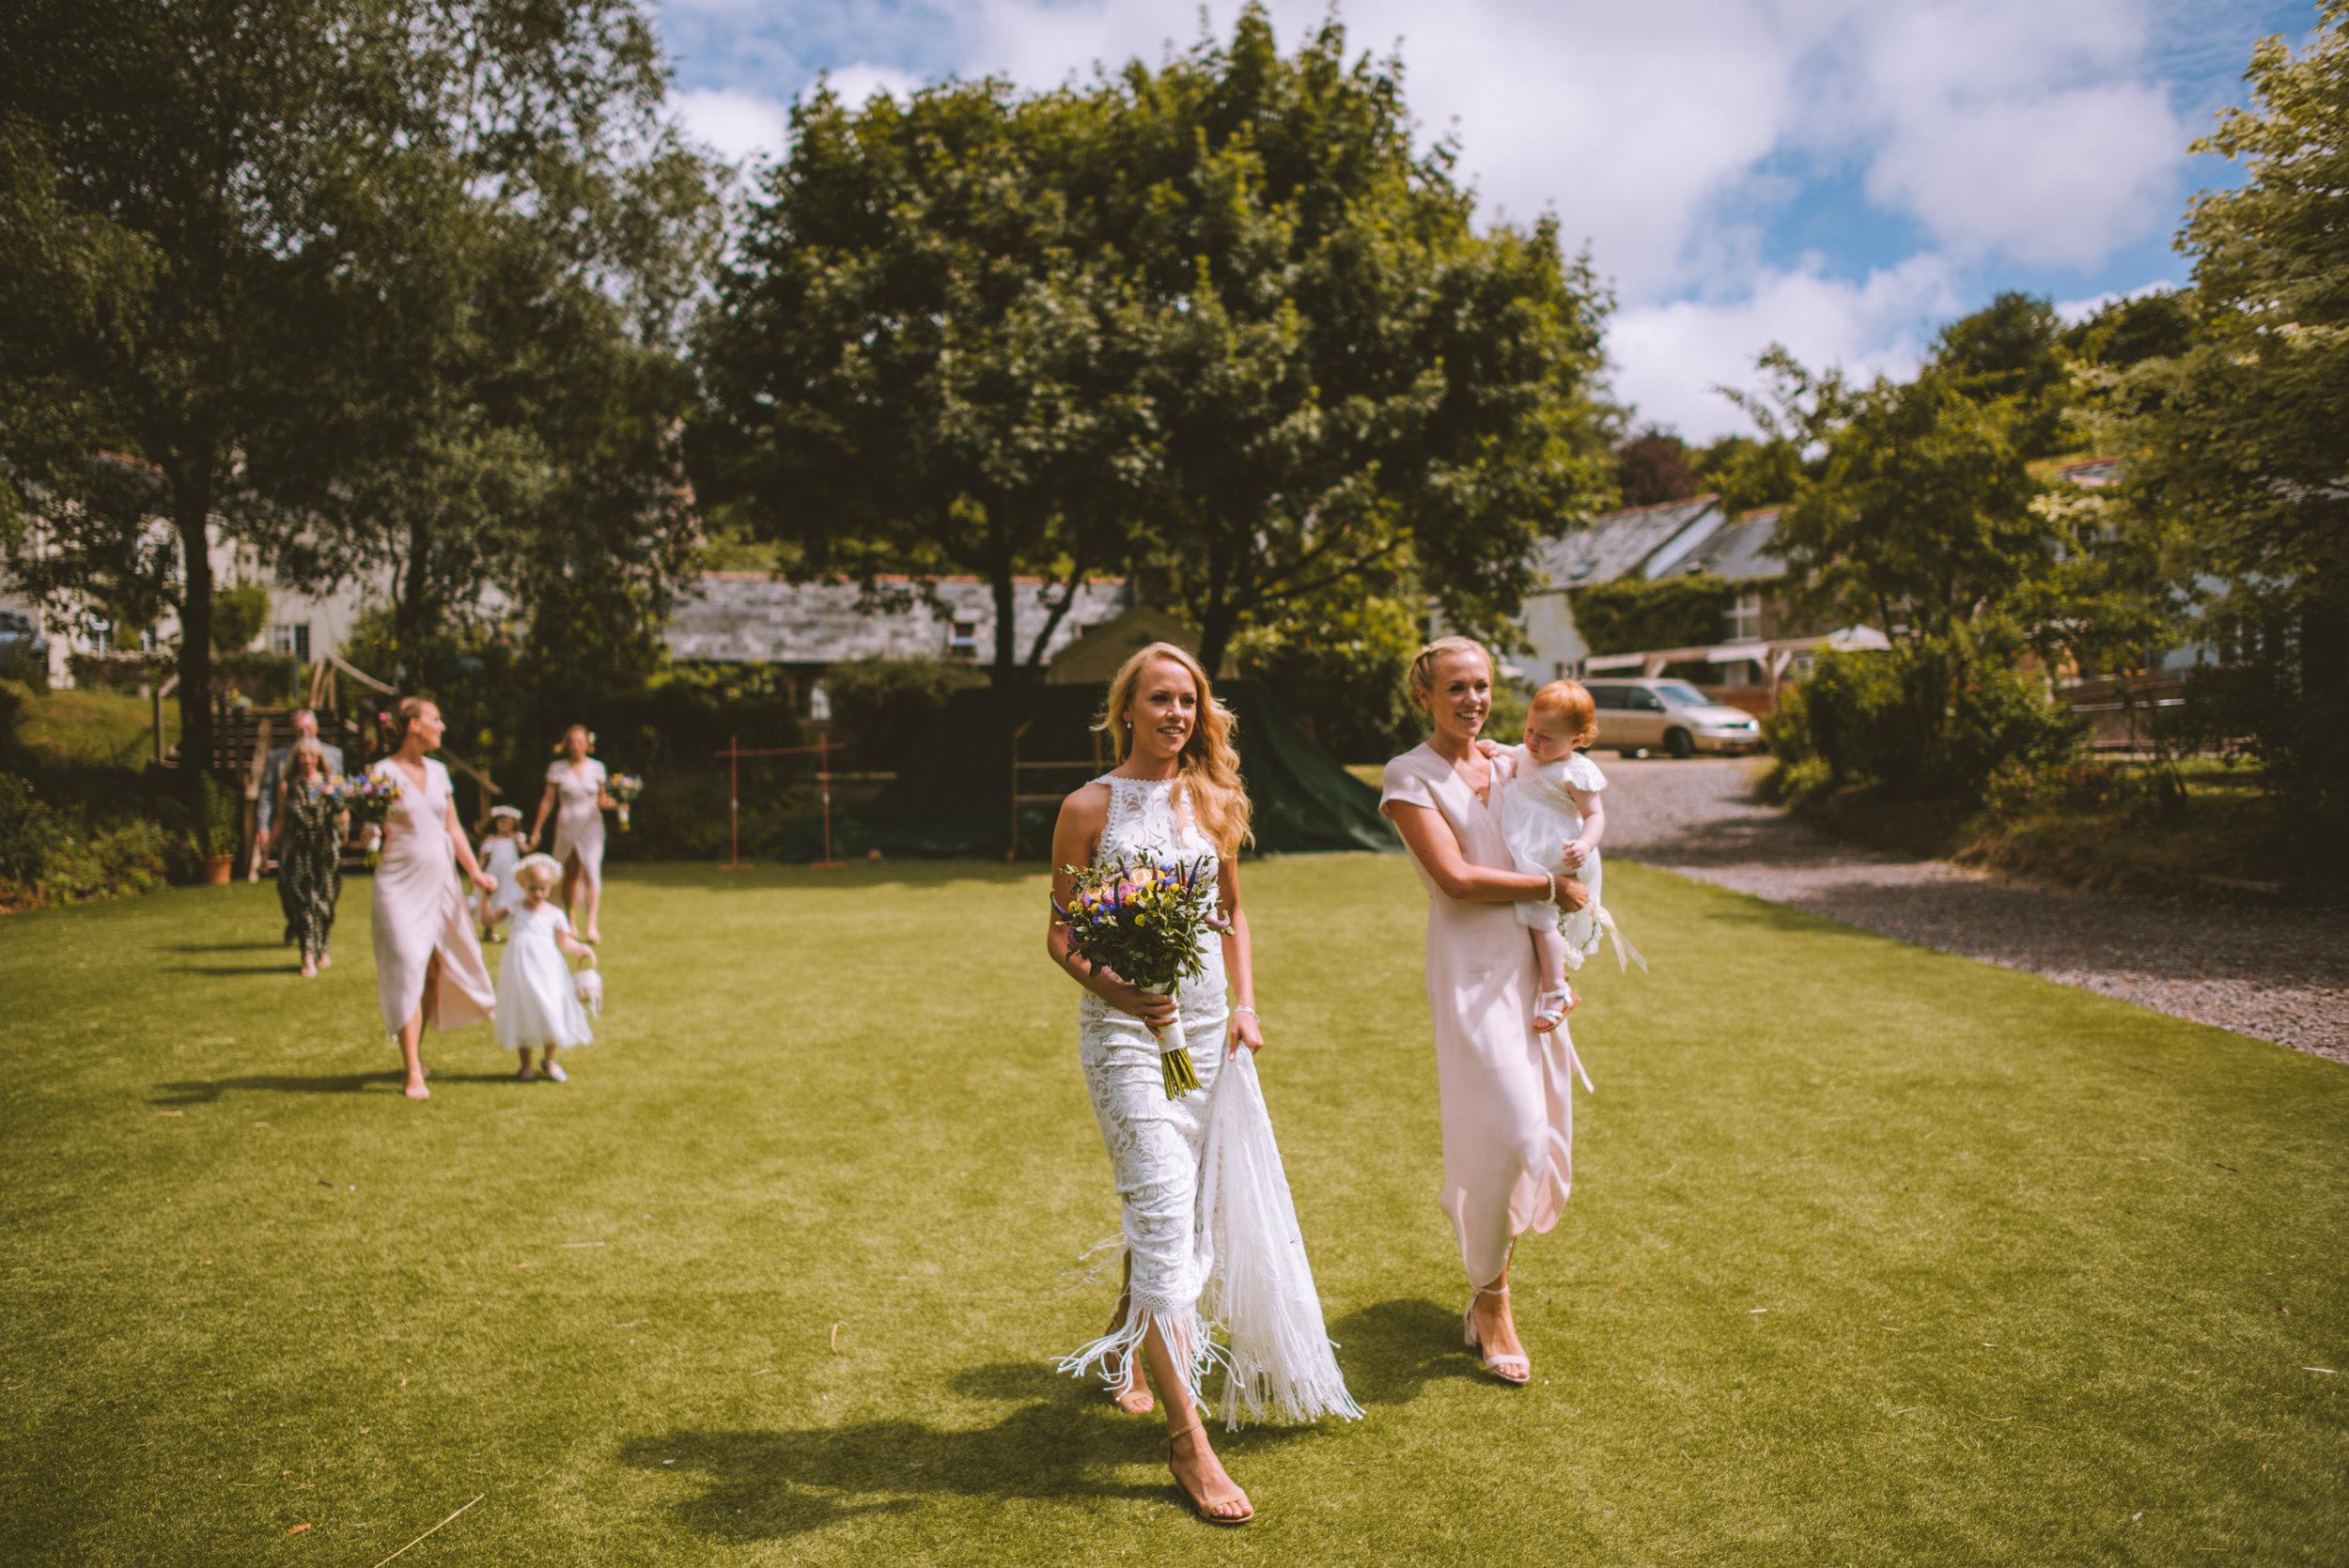 deers-leap-wedding-photographer-25.jpg